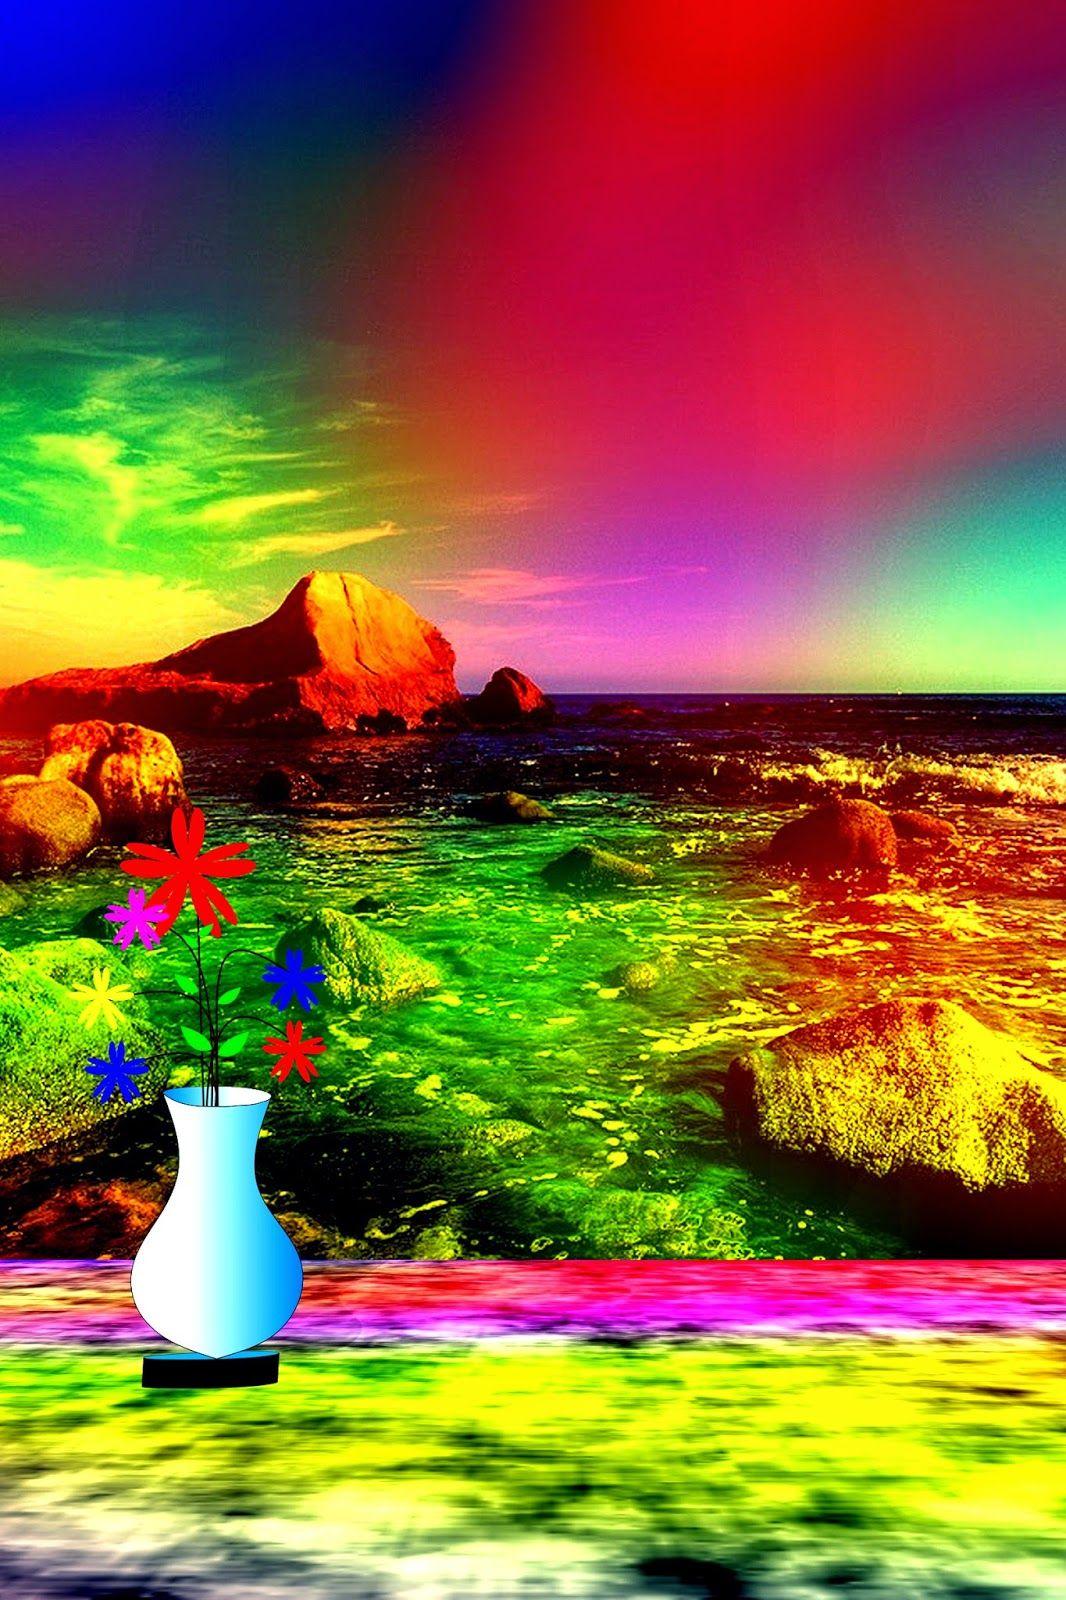 New Studio Background HD free download.